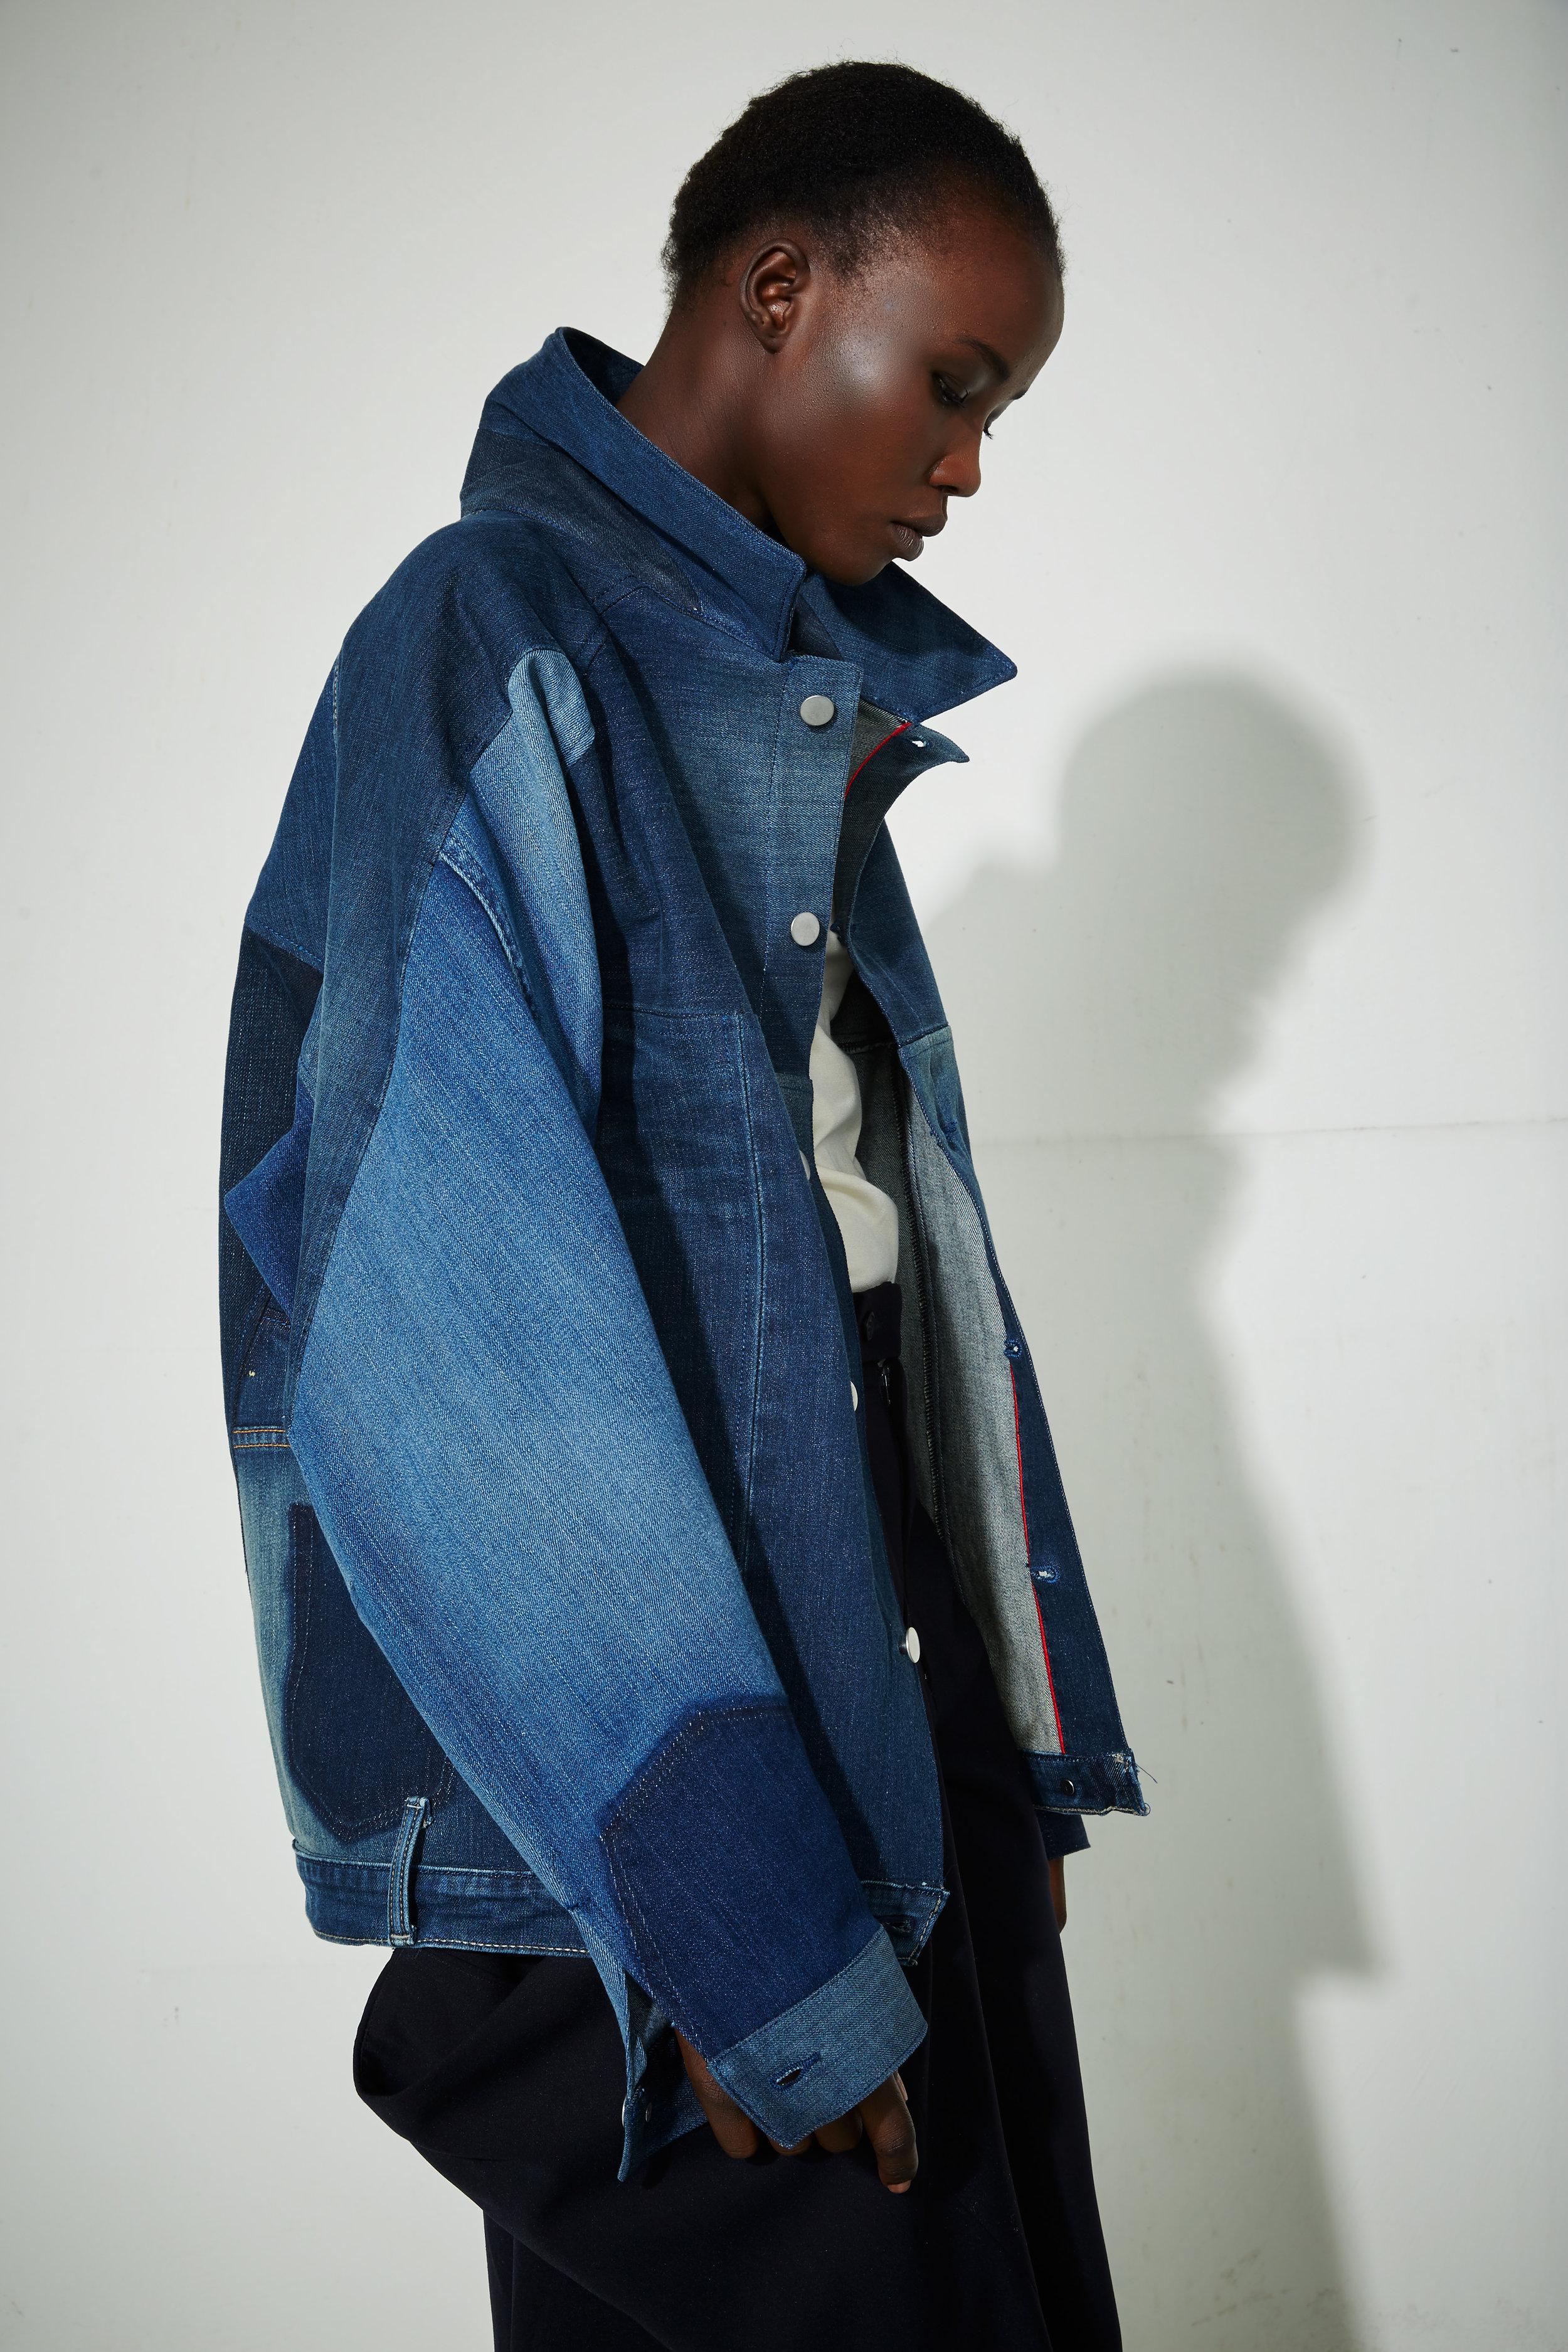 Paul Castro Emerging Fashion Australia